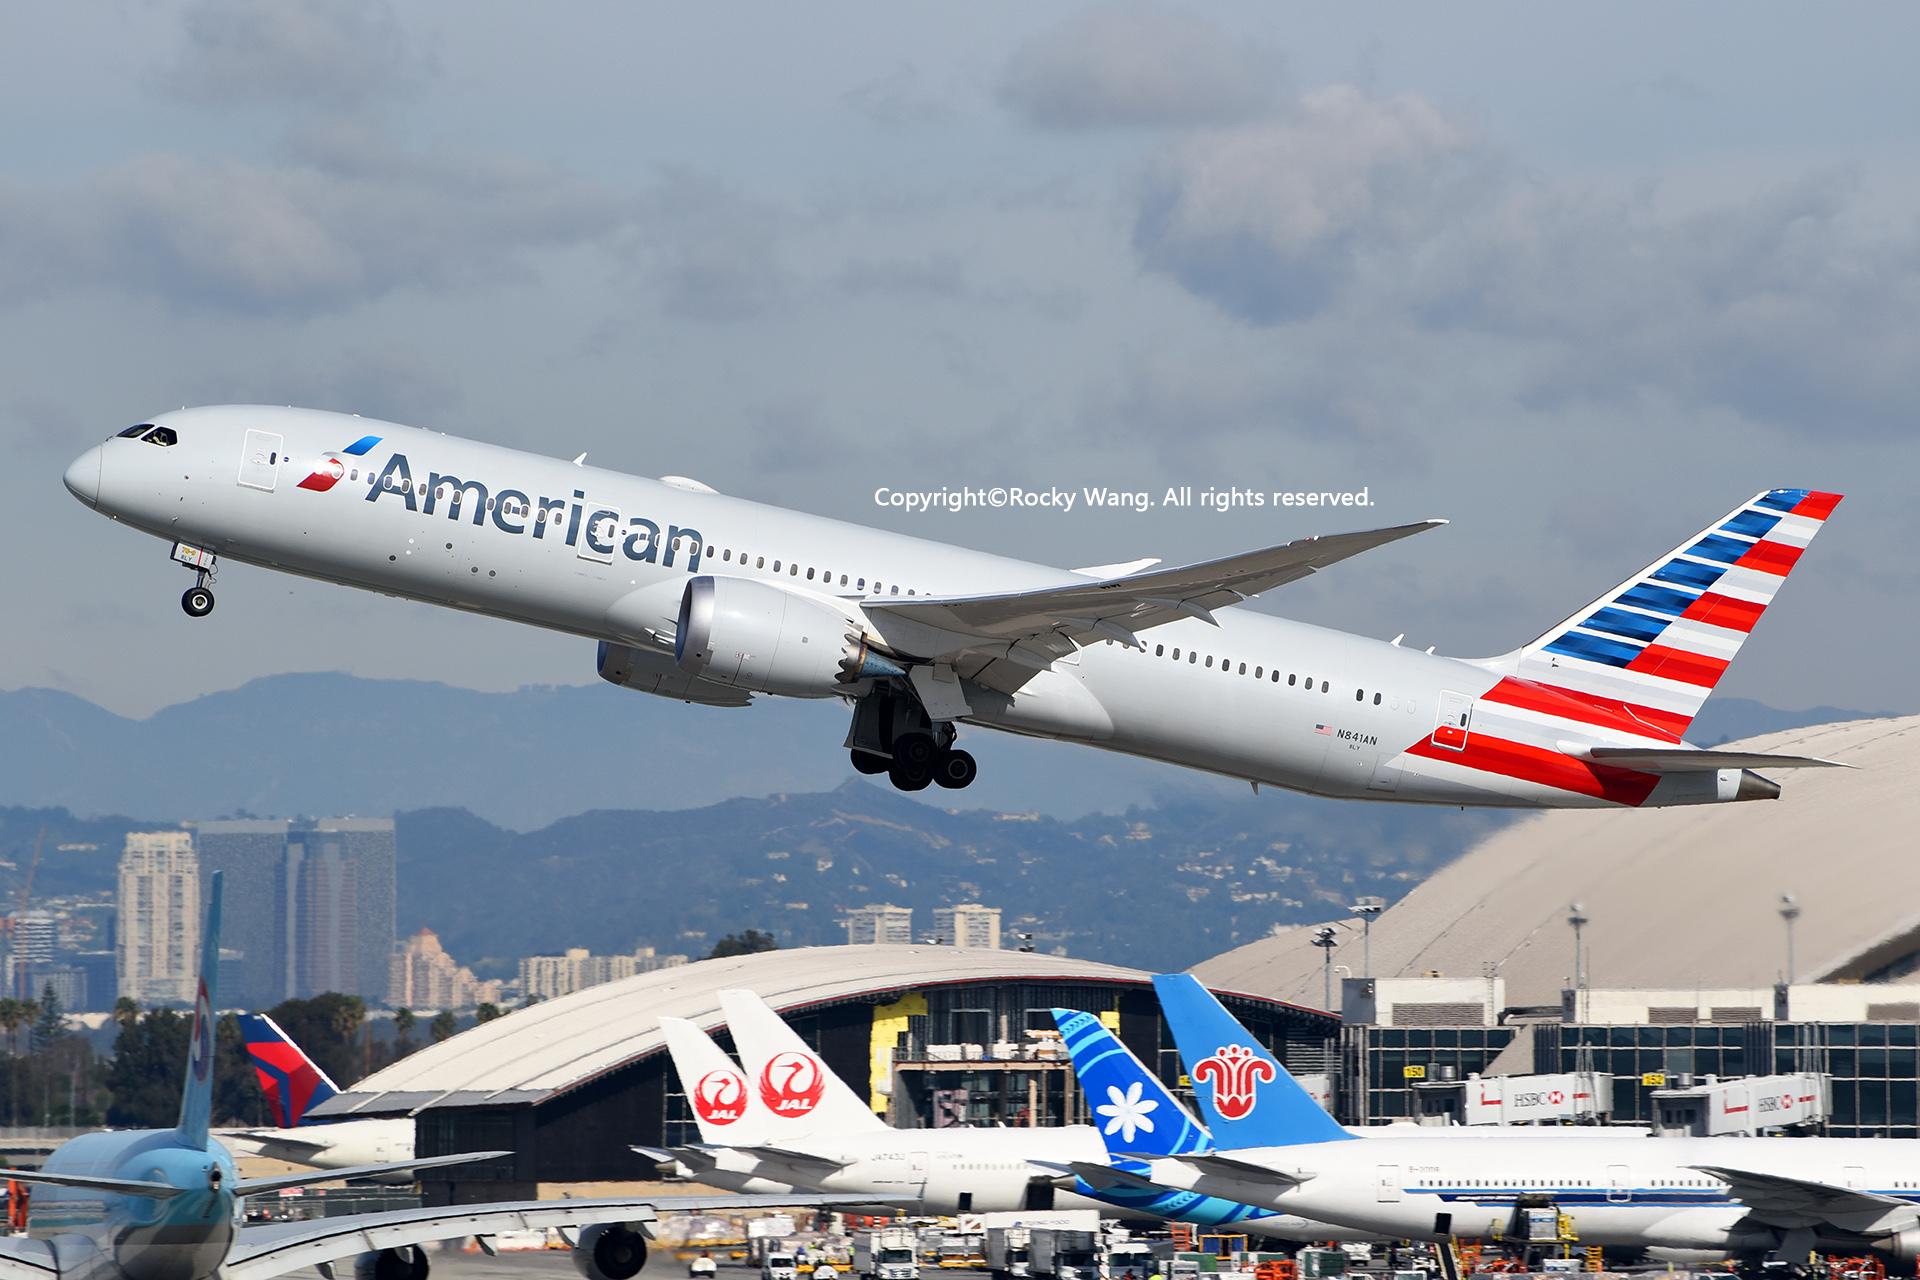 Re:[原创]随便来一组 不凑30图了 BOEING 787-9 DREAMLINER N841AN Los Angeles Int'l Airport